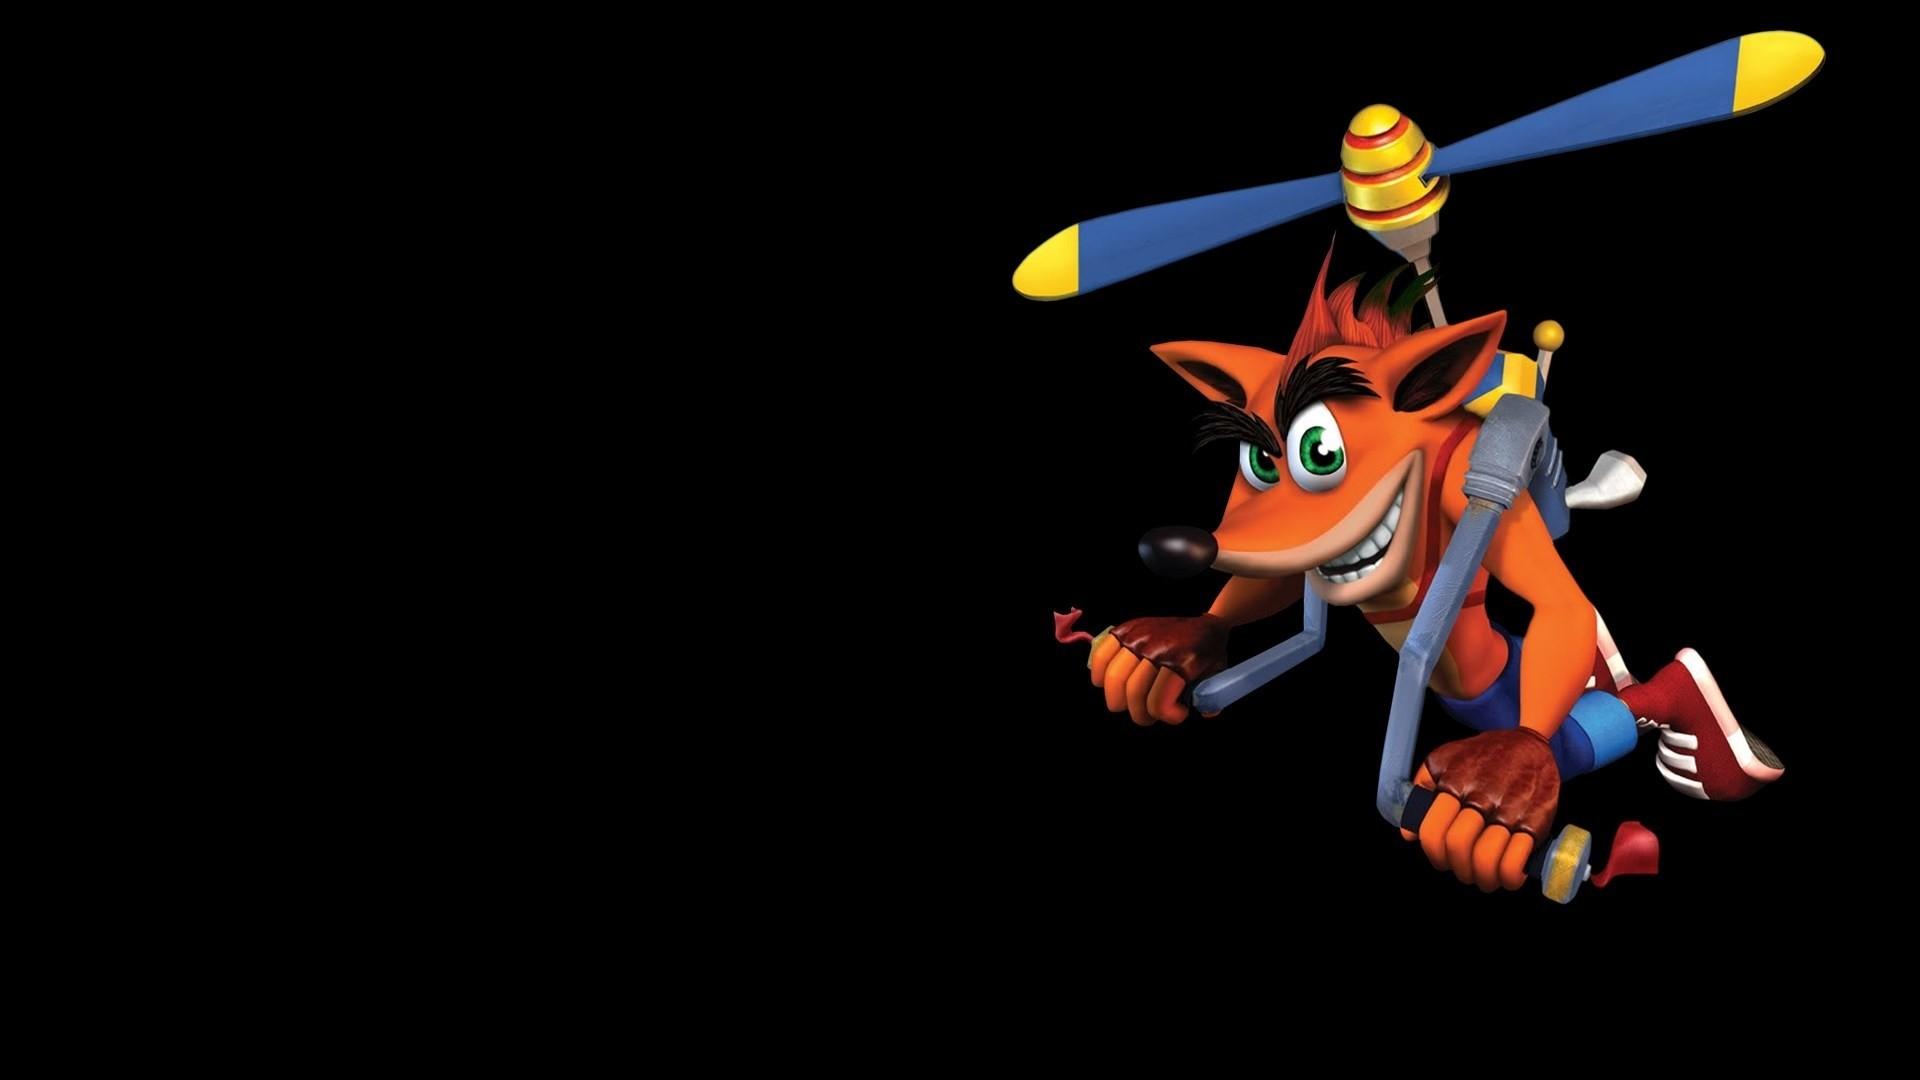 Crash Bandicoot Wallpaper image hd